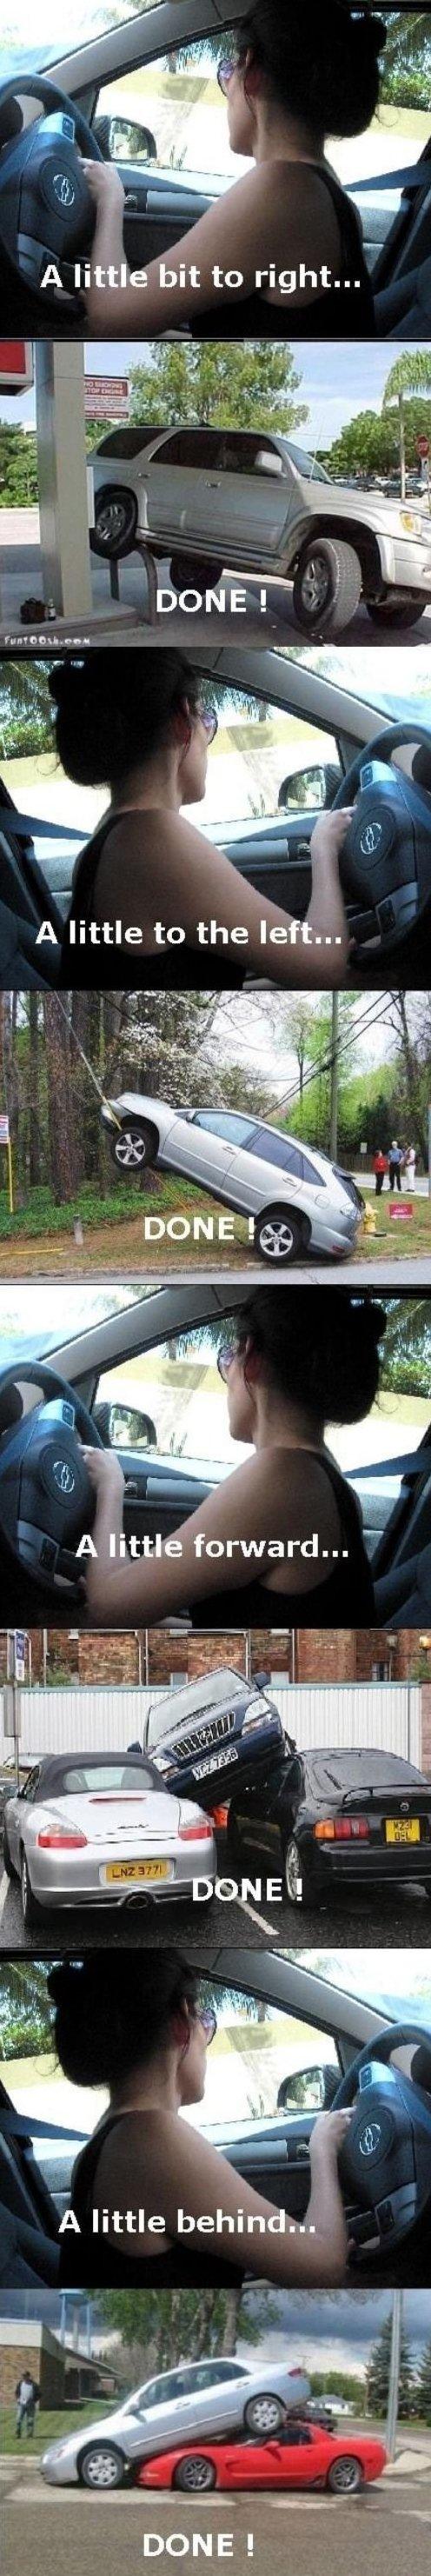 Women Parking